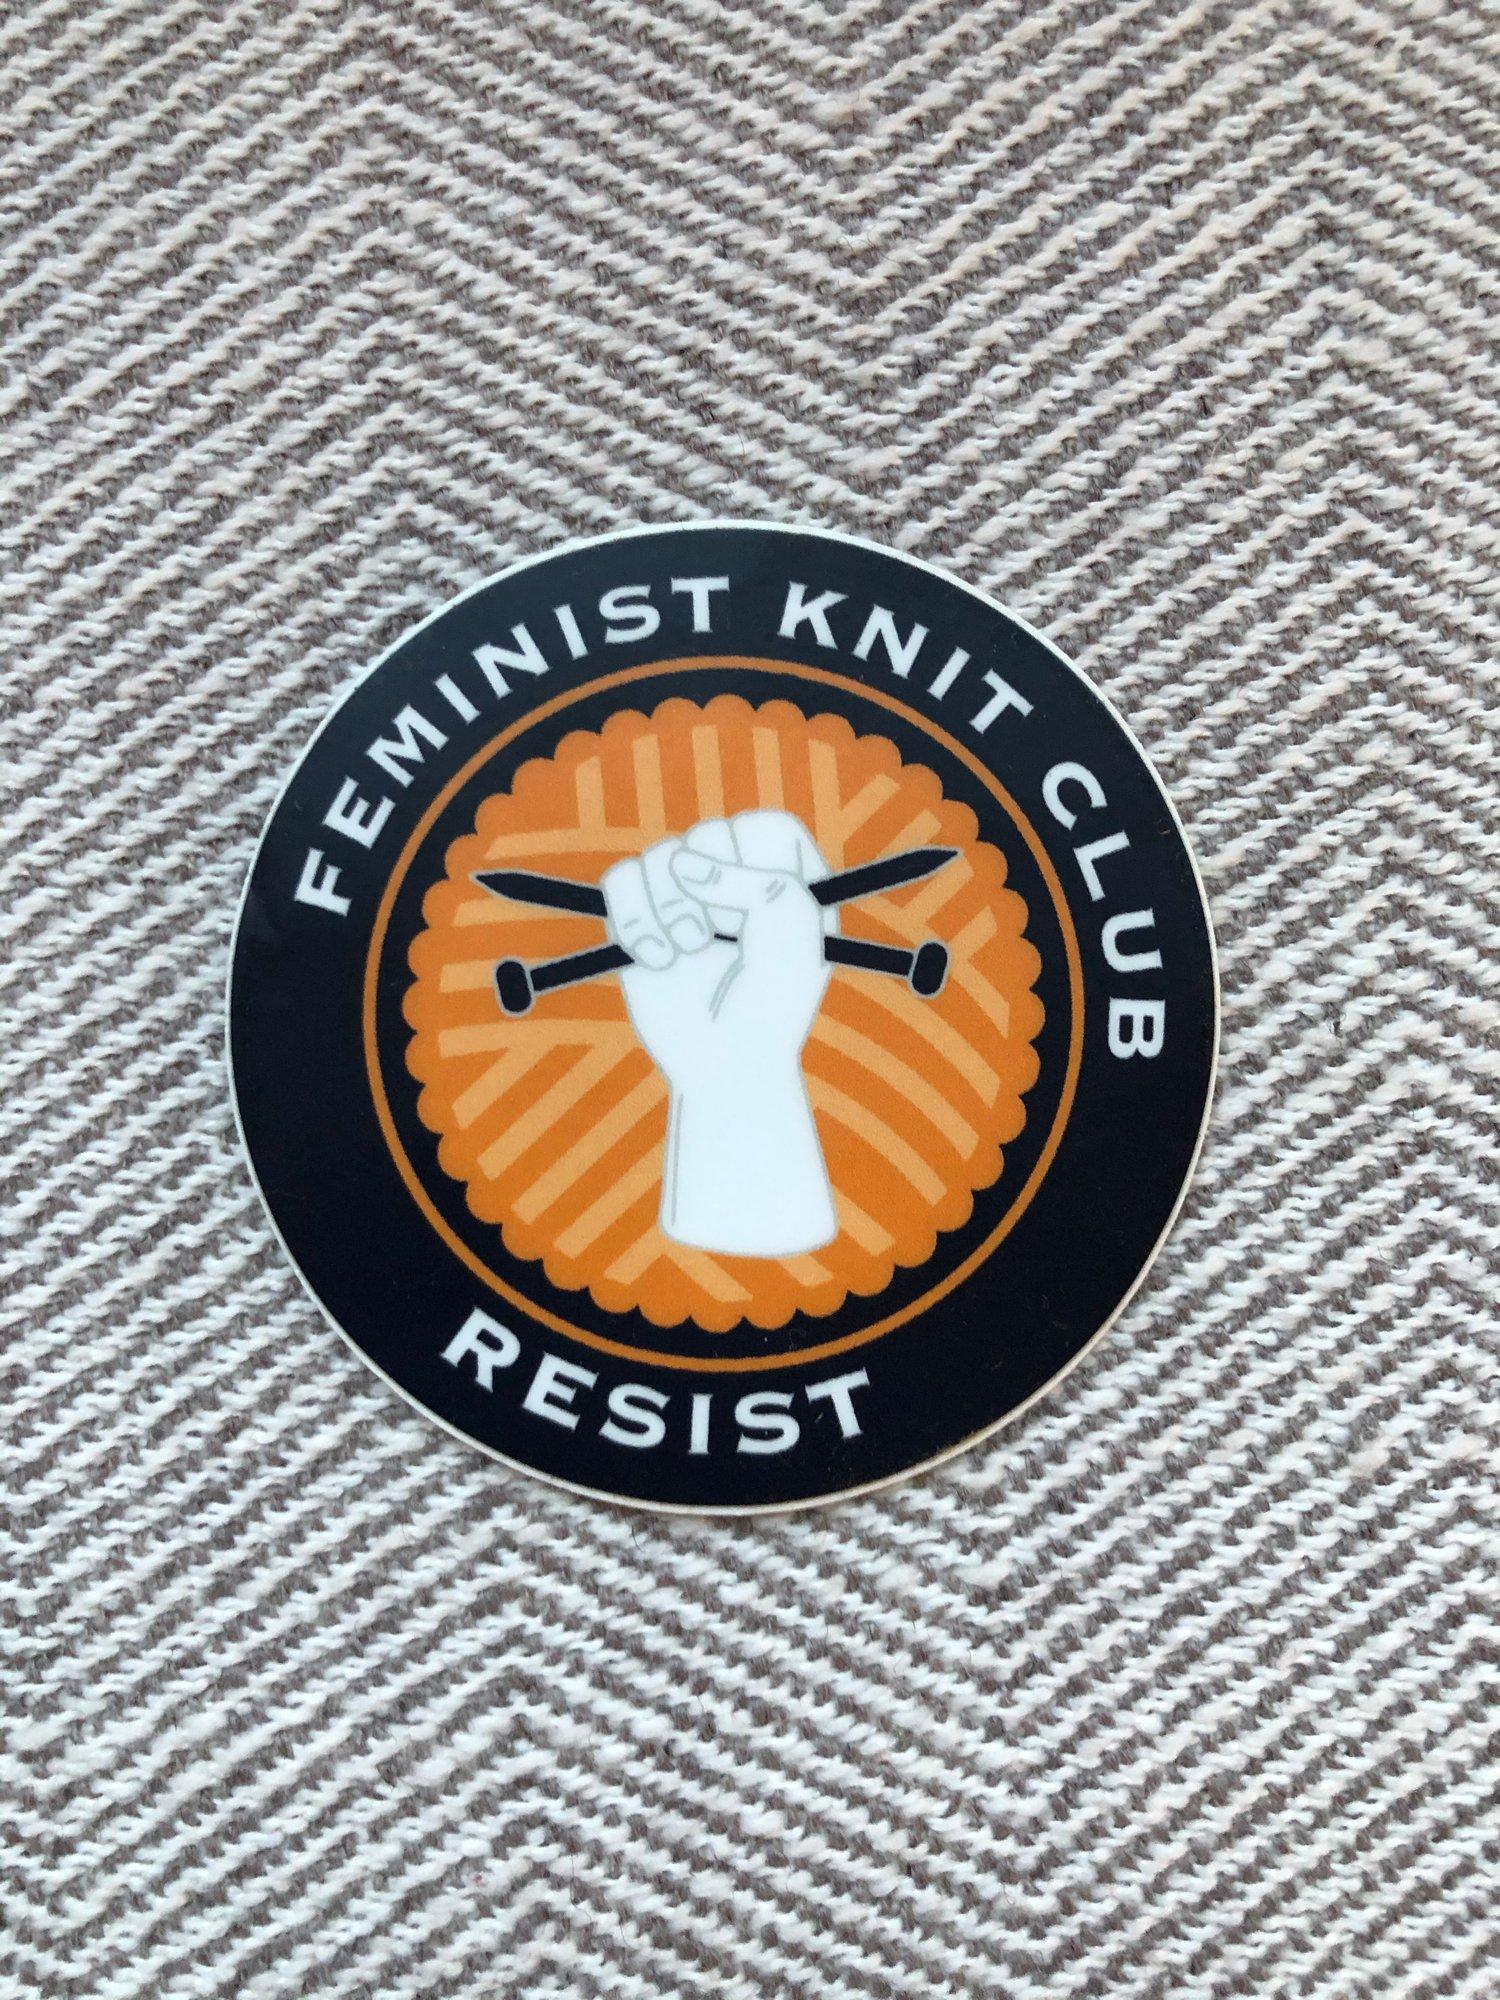 Image of Feminist Knit Club